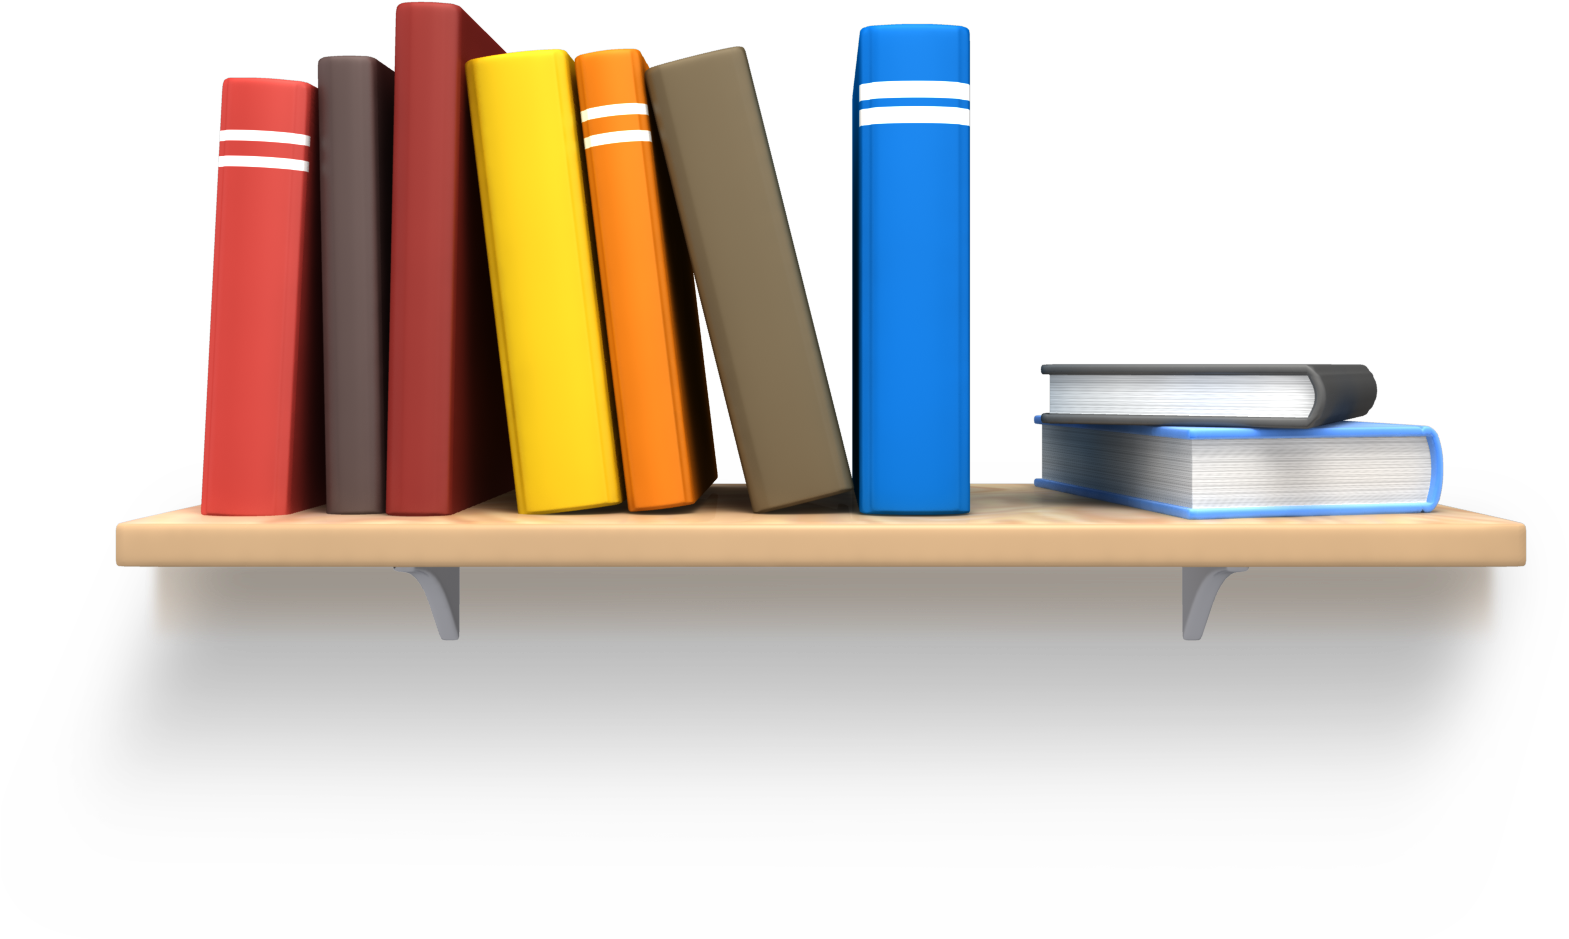 Shelf Bookcase Clip Art.